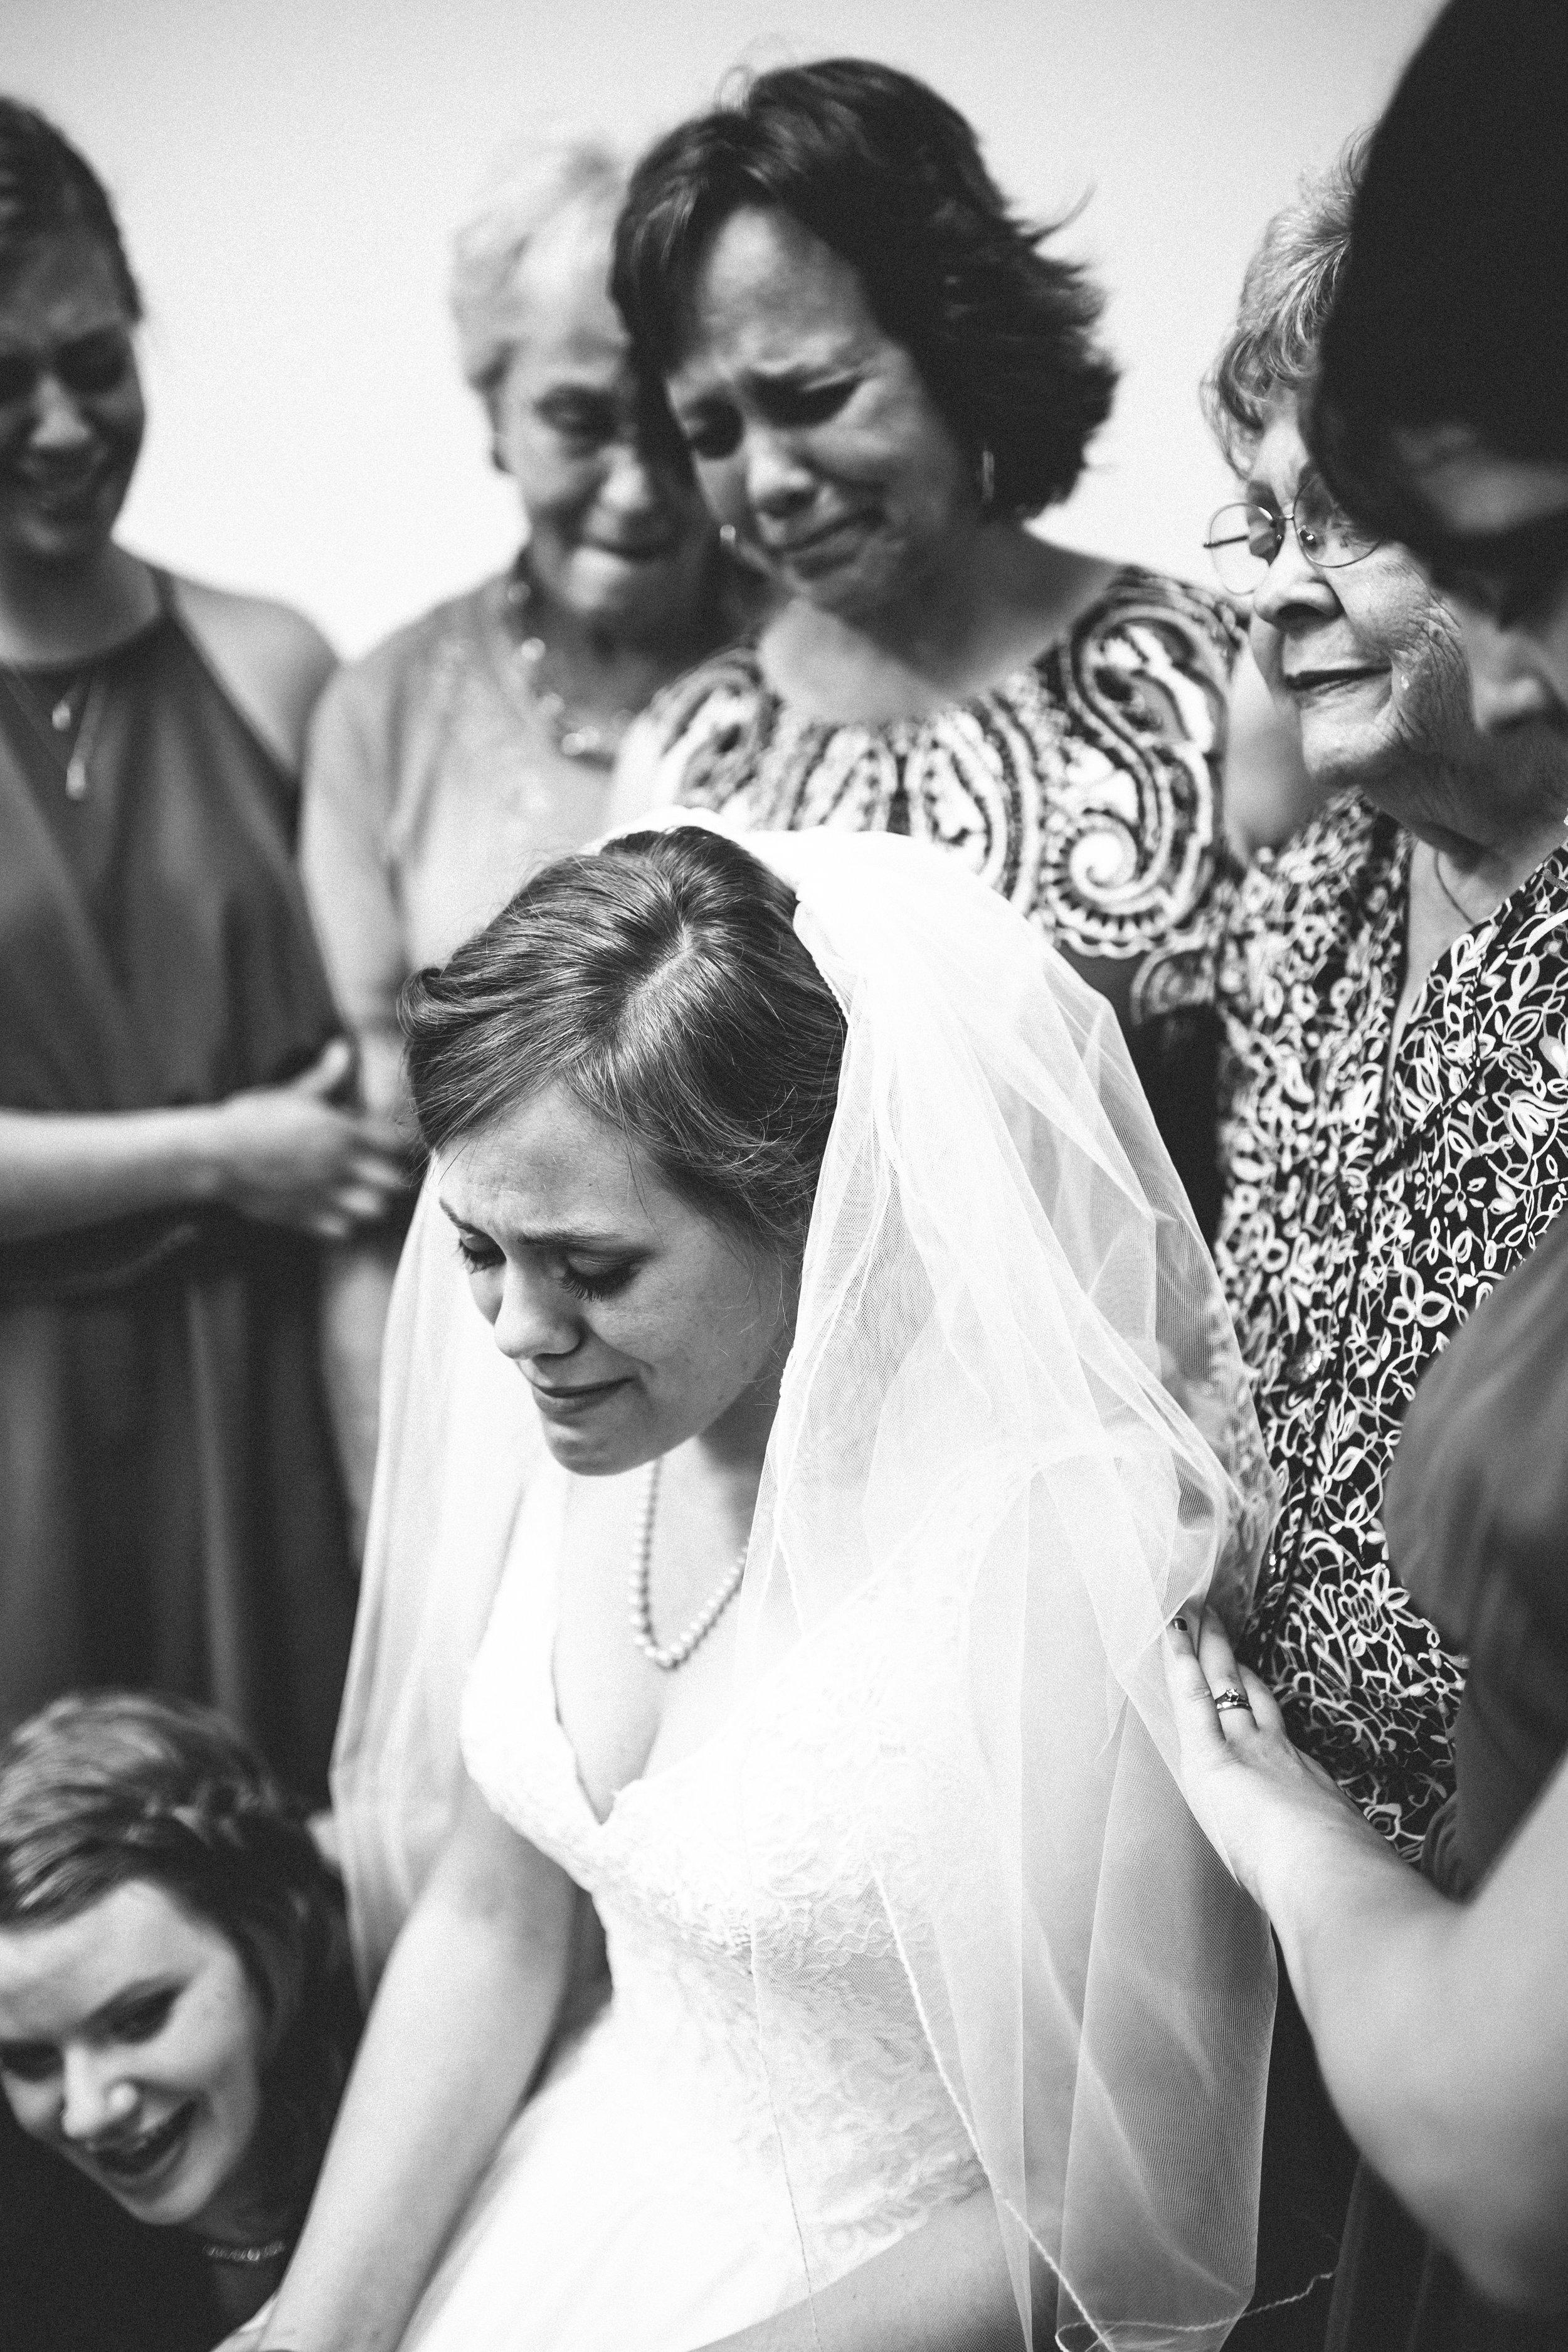 Jordan & Shantel Married - Idaho - Corrie Mick Photography-62.jpg